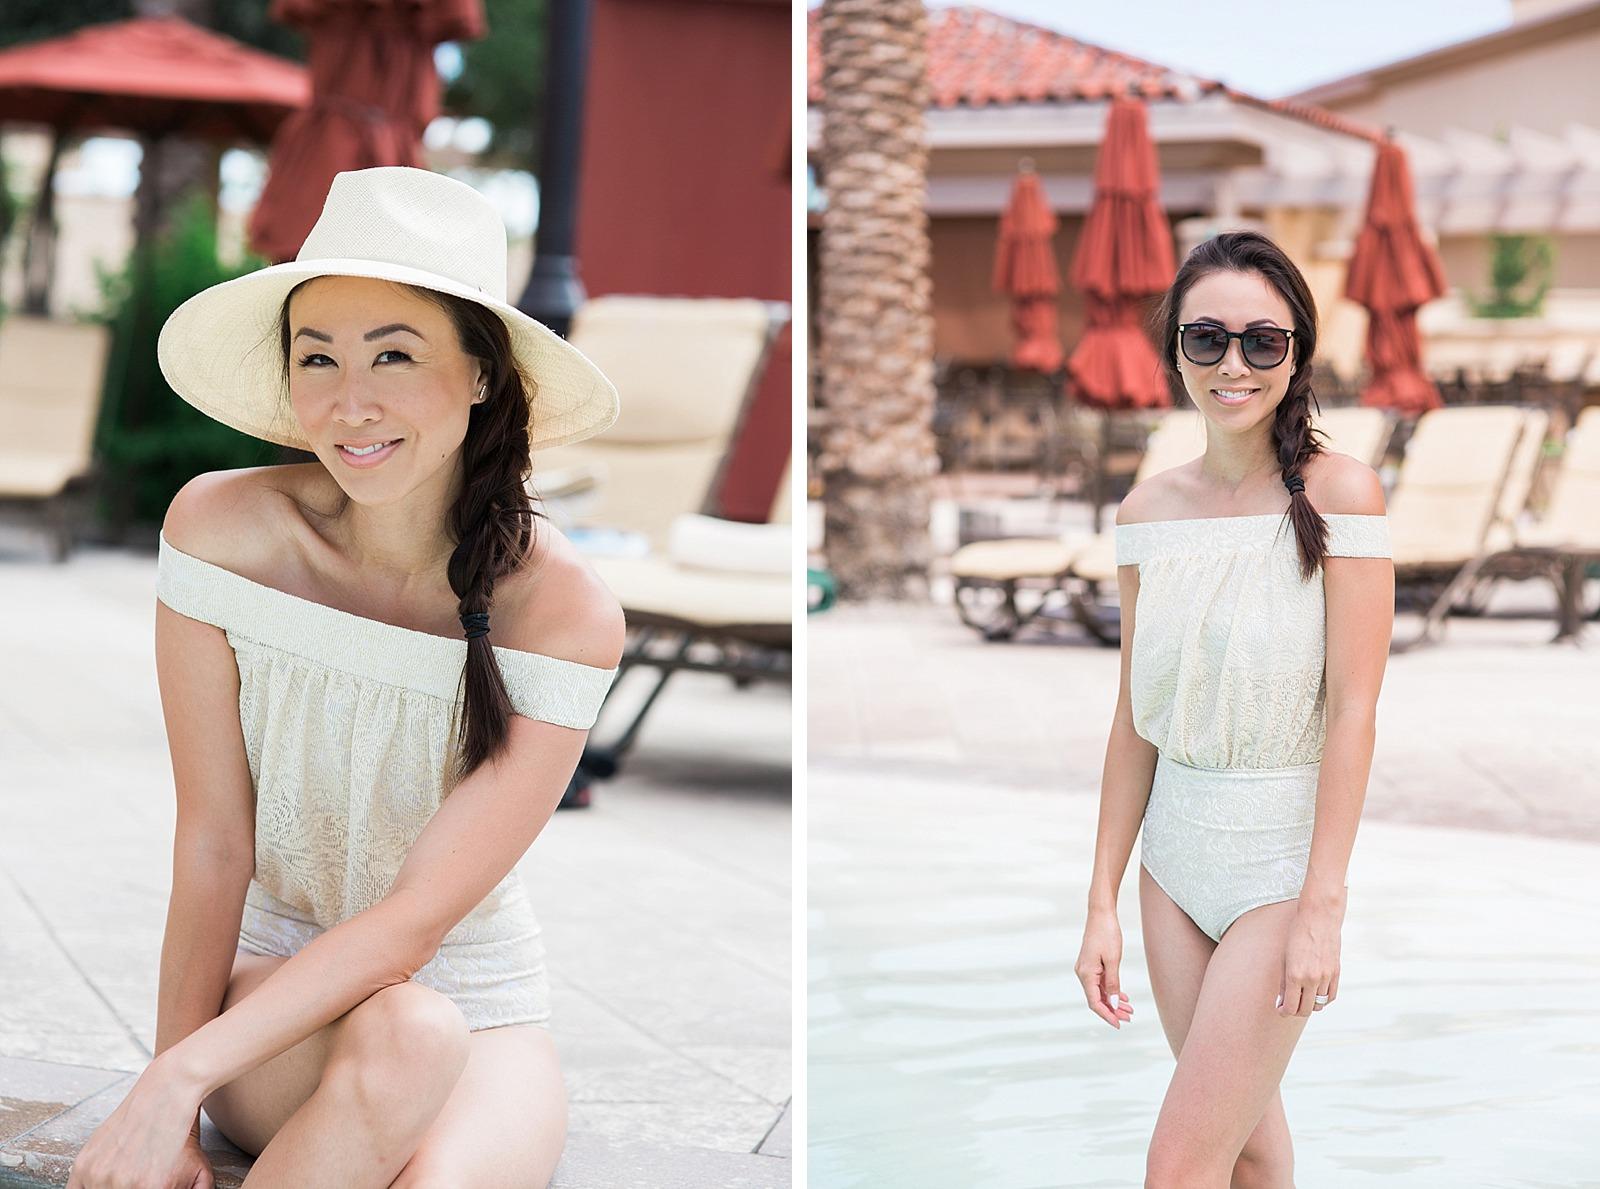 off-shoulder-bikini-riot-swimsuit-casino-del-sol-diana-elizabeth-blog-lifestyle-blogger-style_0042